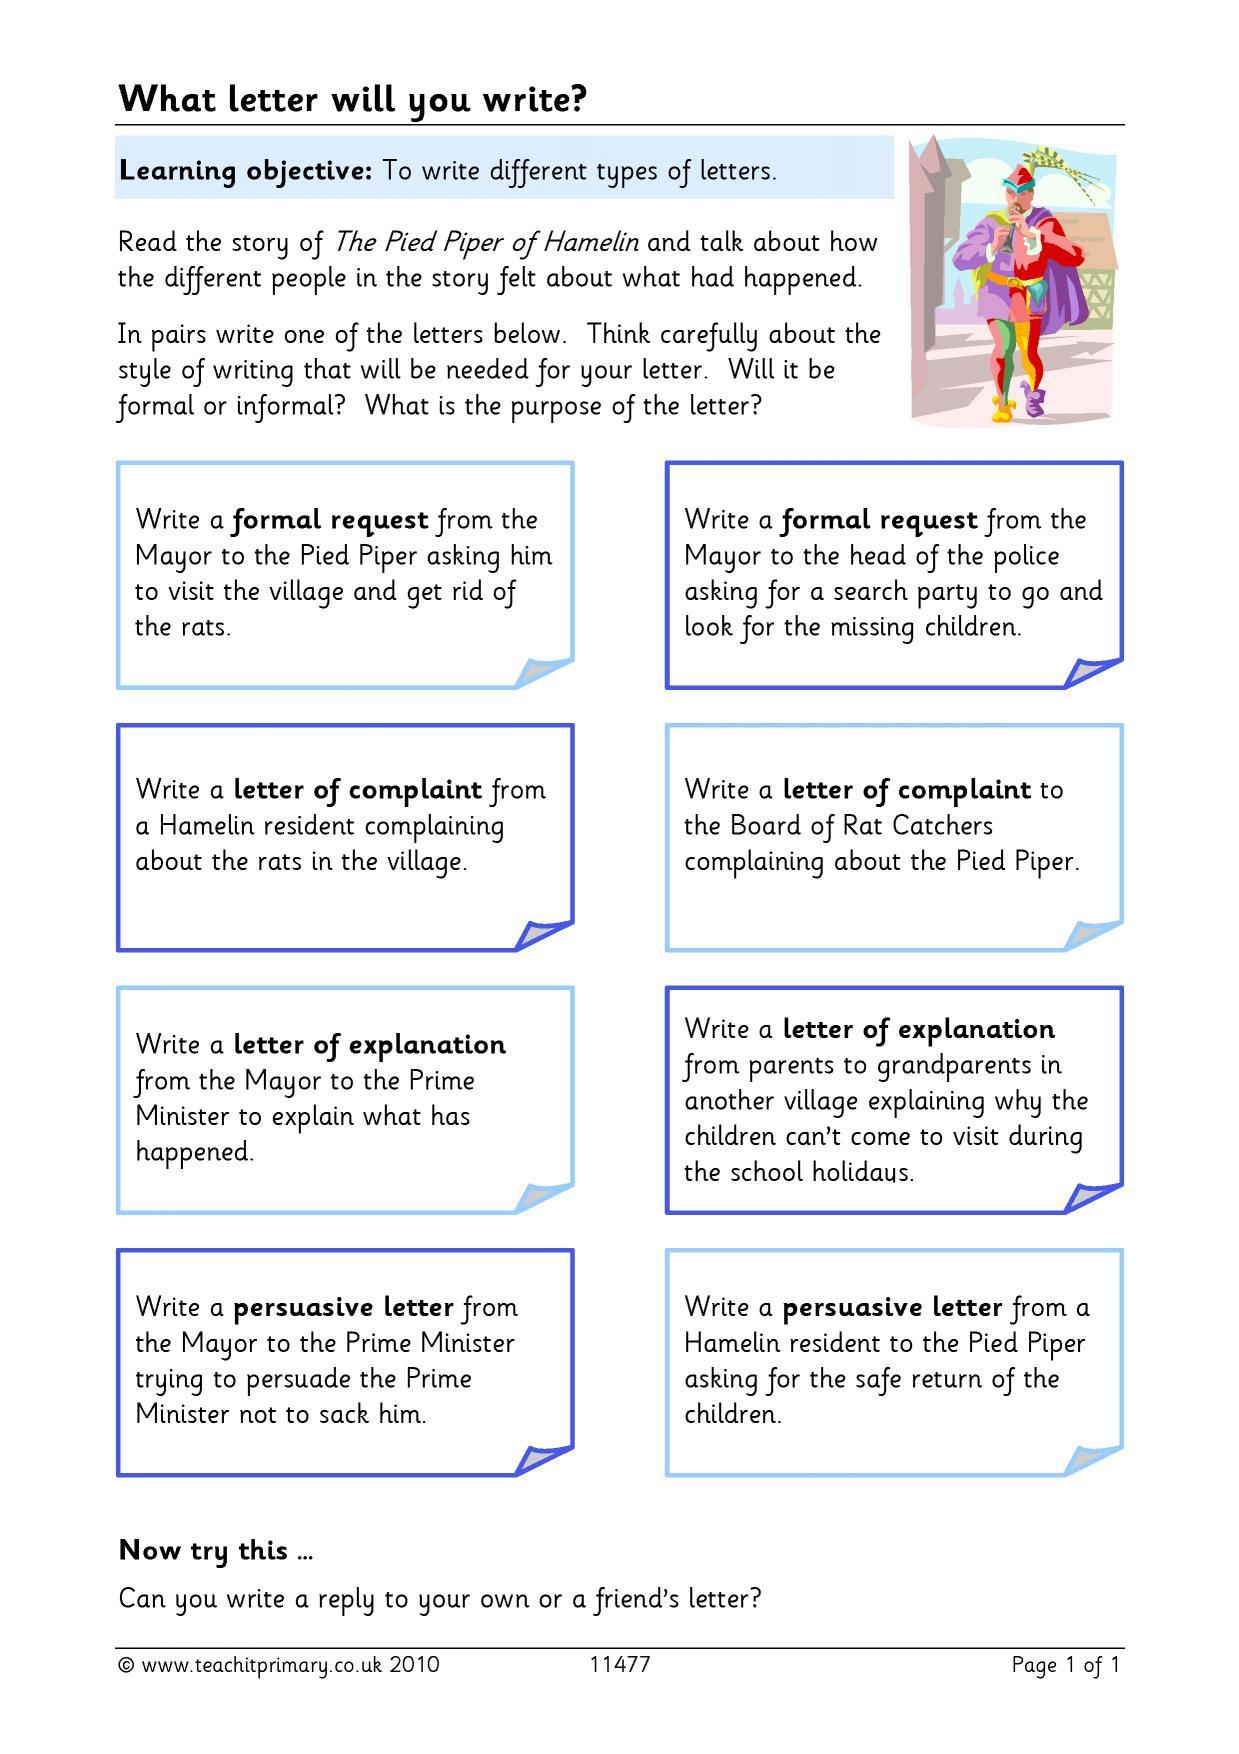 Eyfs ks1 ks2 letter writing teachit primary 2 preview thecheapjerseys Images